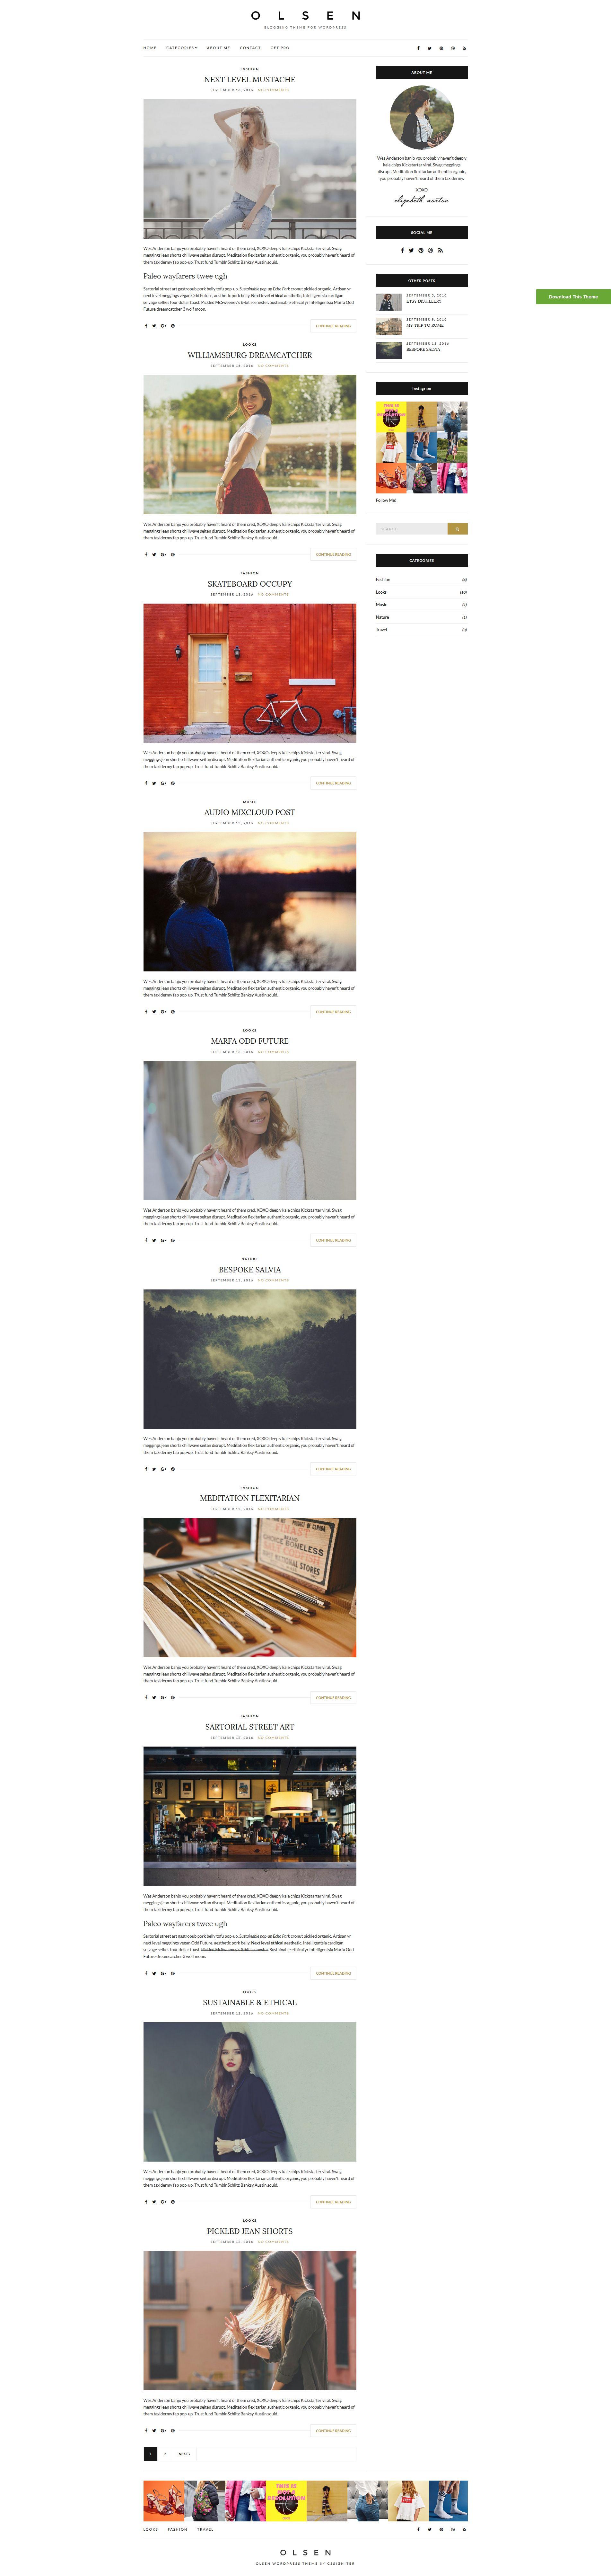 Olsen Light - wordpress šablona od cssigniter zdarma